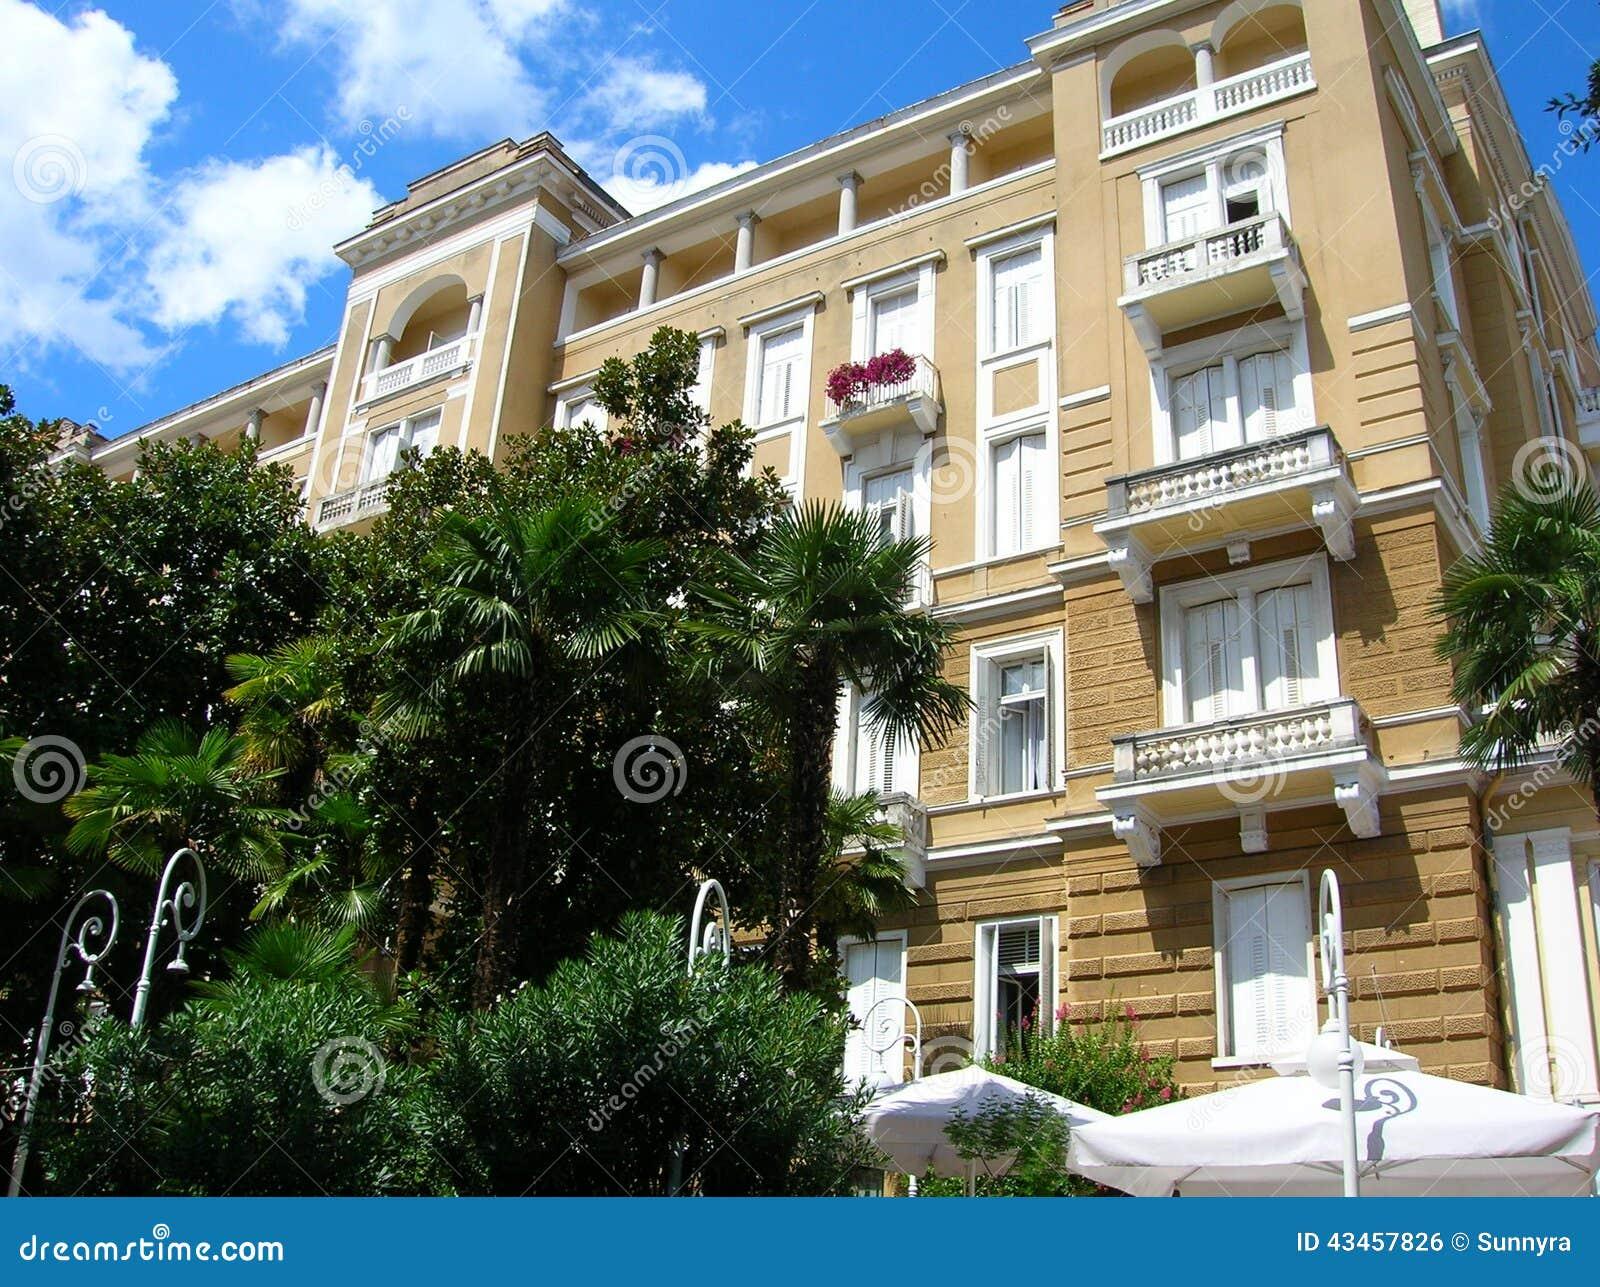 Luxury hotel in opatija stock photo image 43457826 for Design hotel opatija croatia